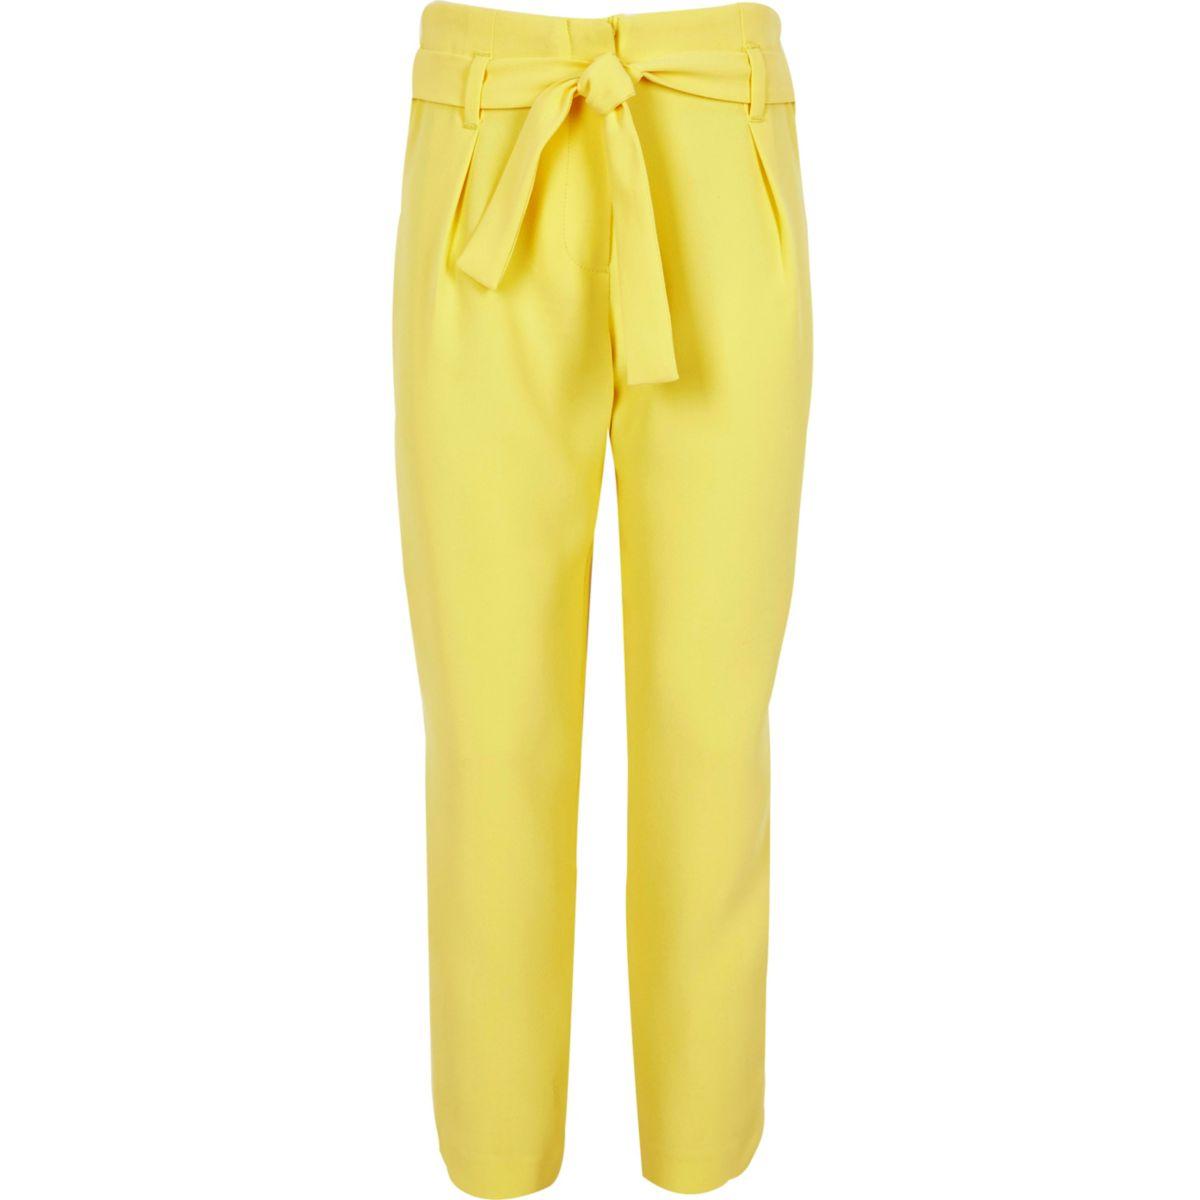 Girls yellow tapered pants